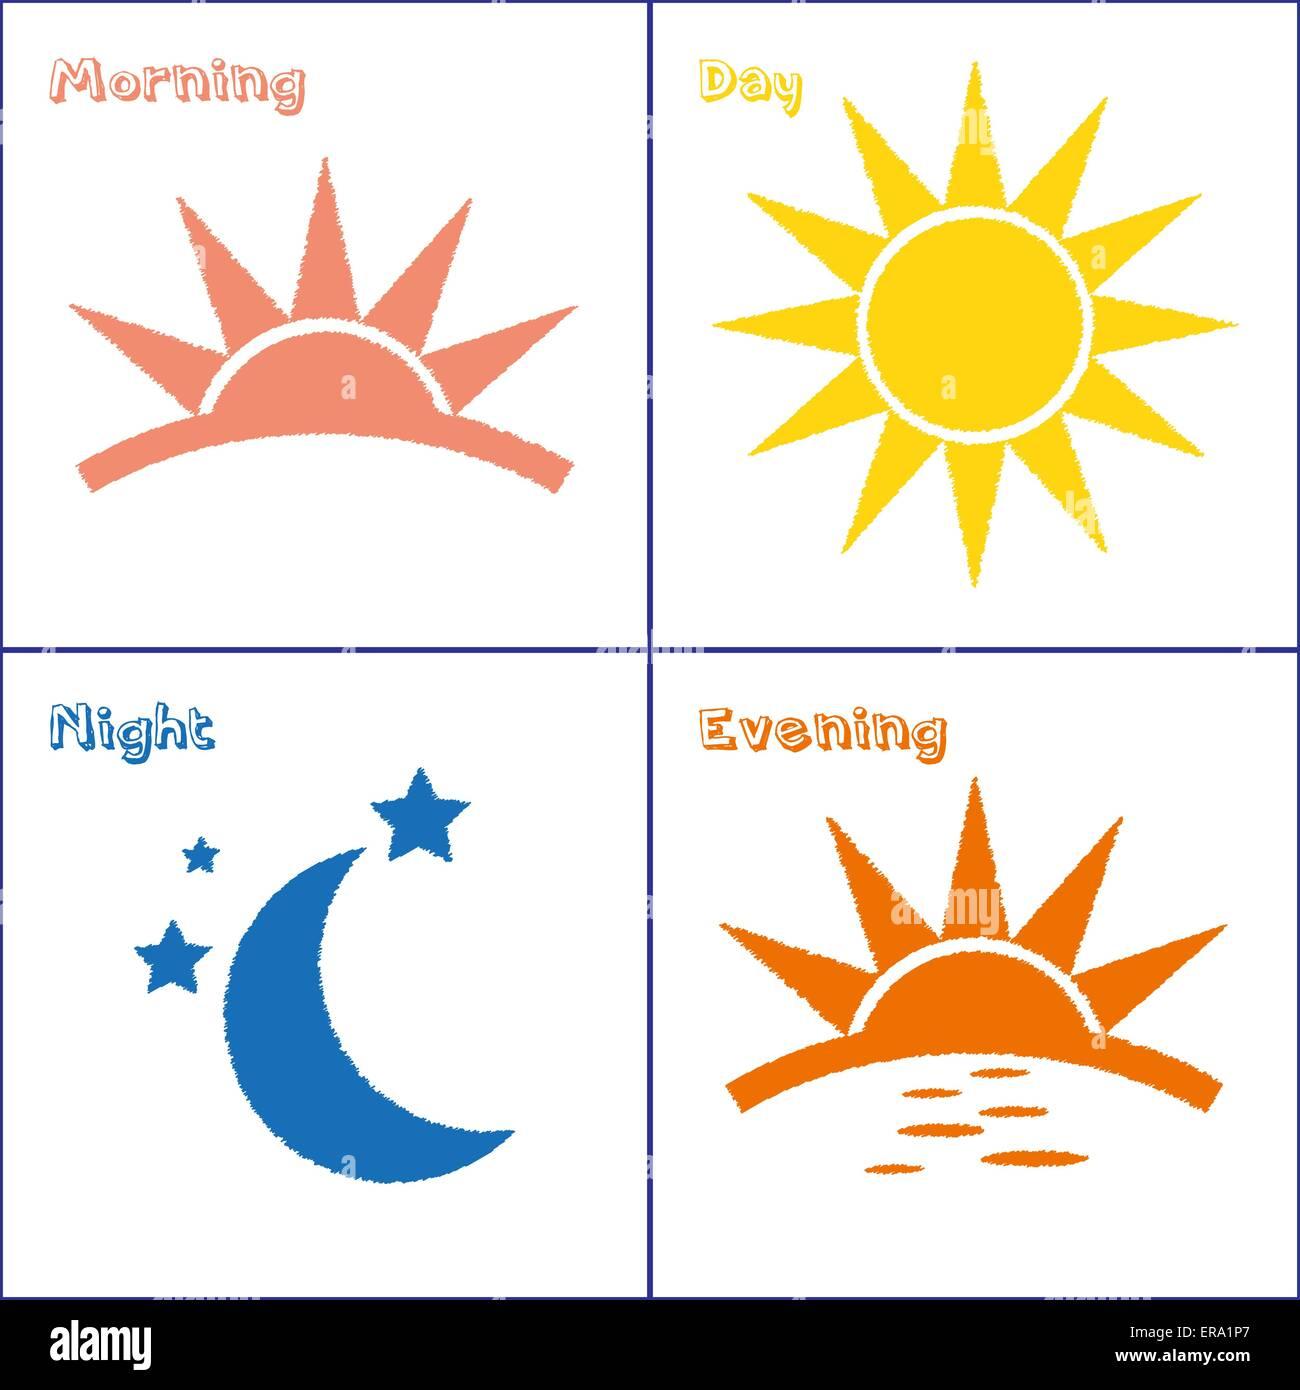 Sun And Moon Morning Day Evening Night Handdrawn Vector